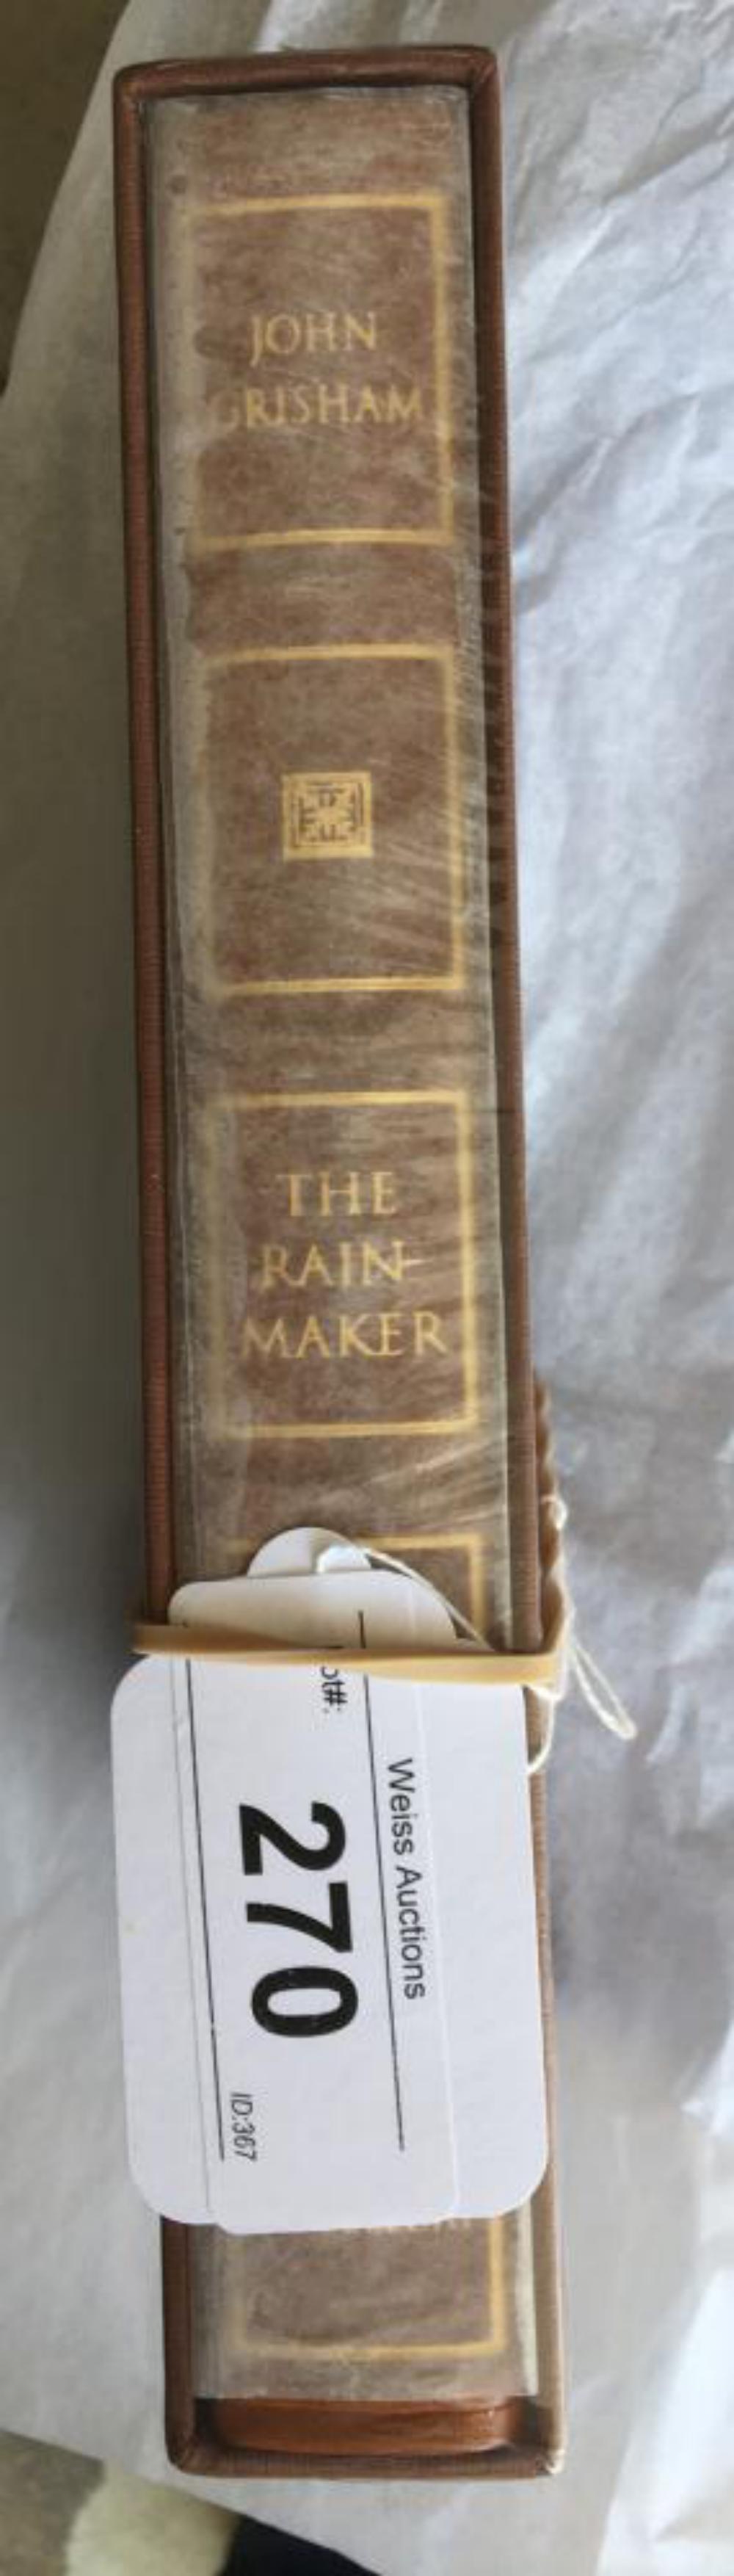 John Grisham. The Rainmaker Limited Edition.